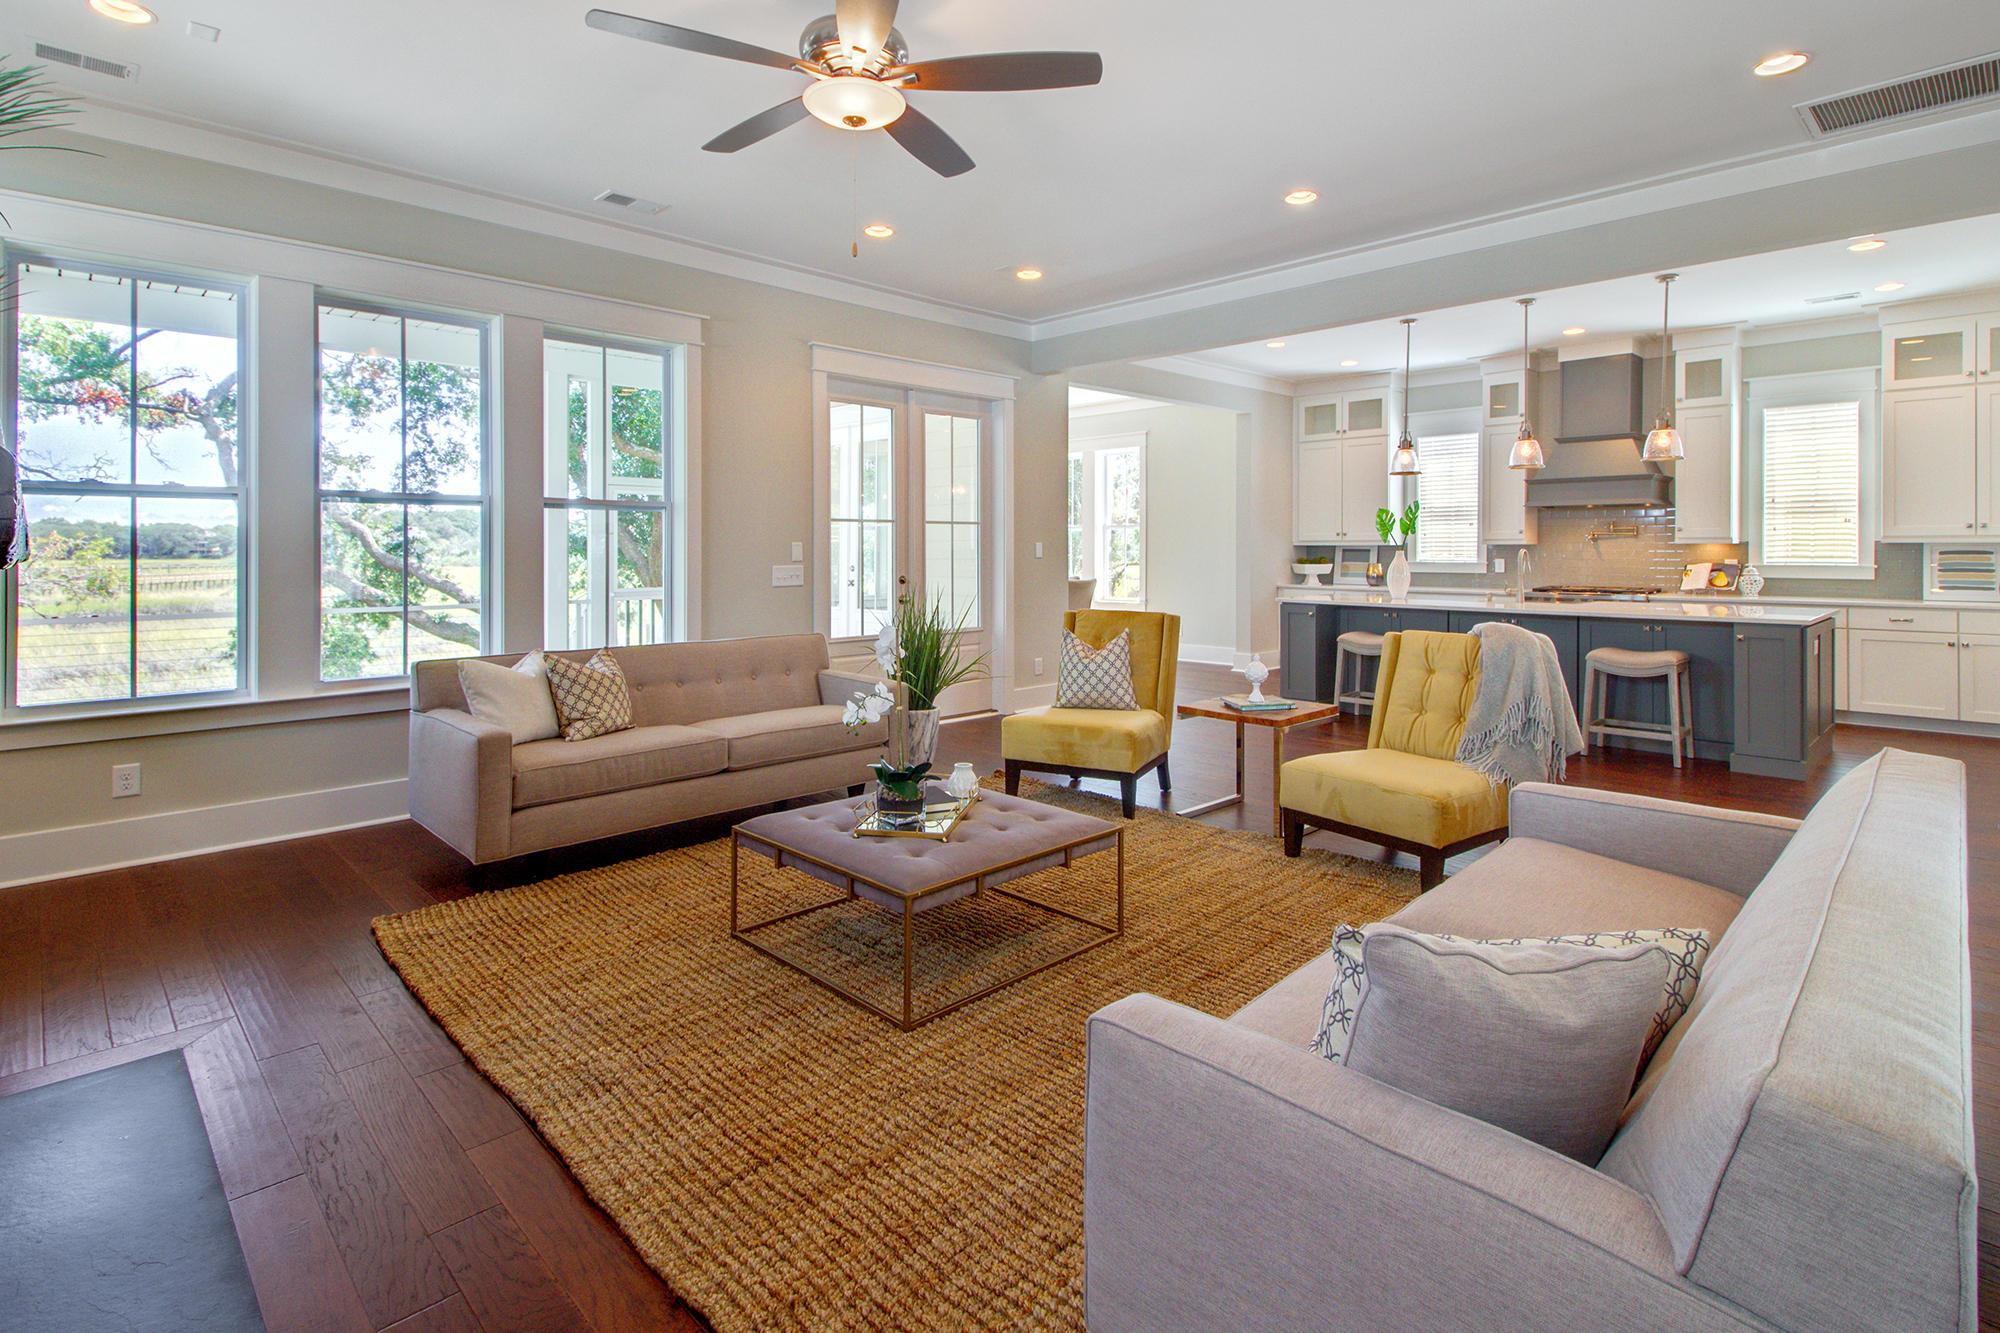 Seaside Plantation Homes For Sale - 1149 Hills Plantation, Charleston, SC - 74